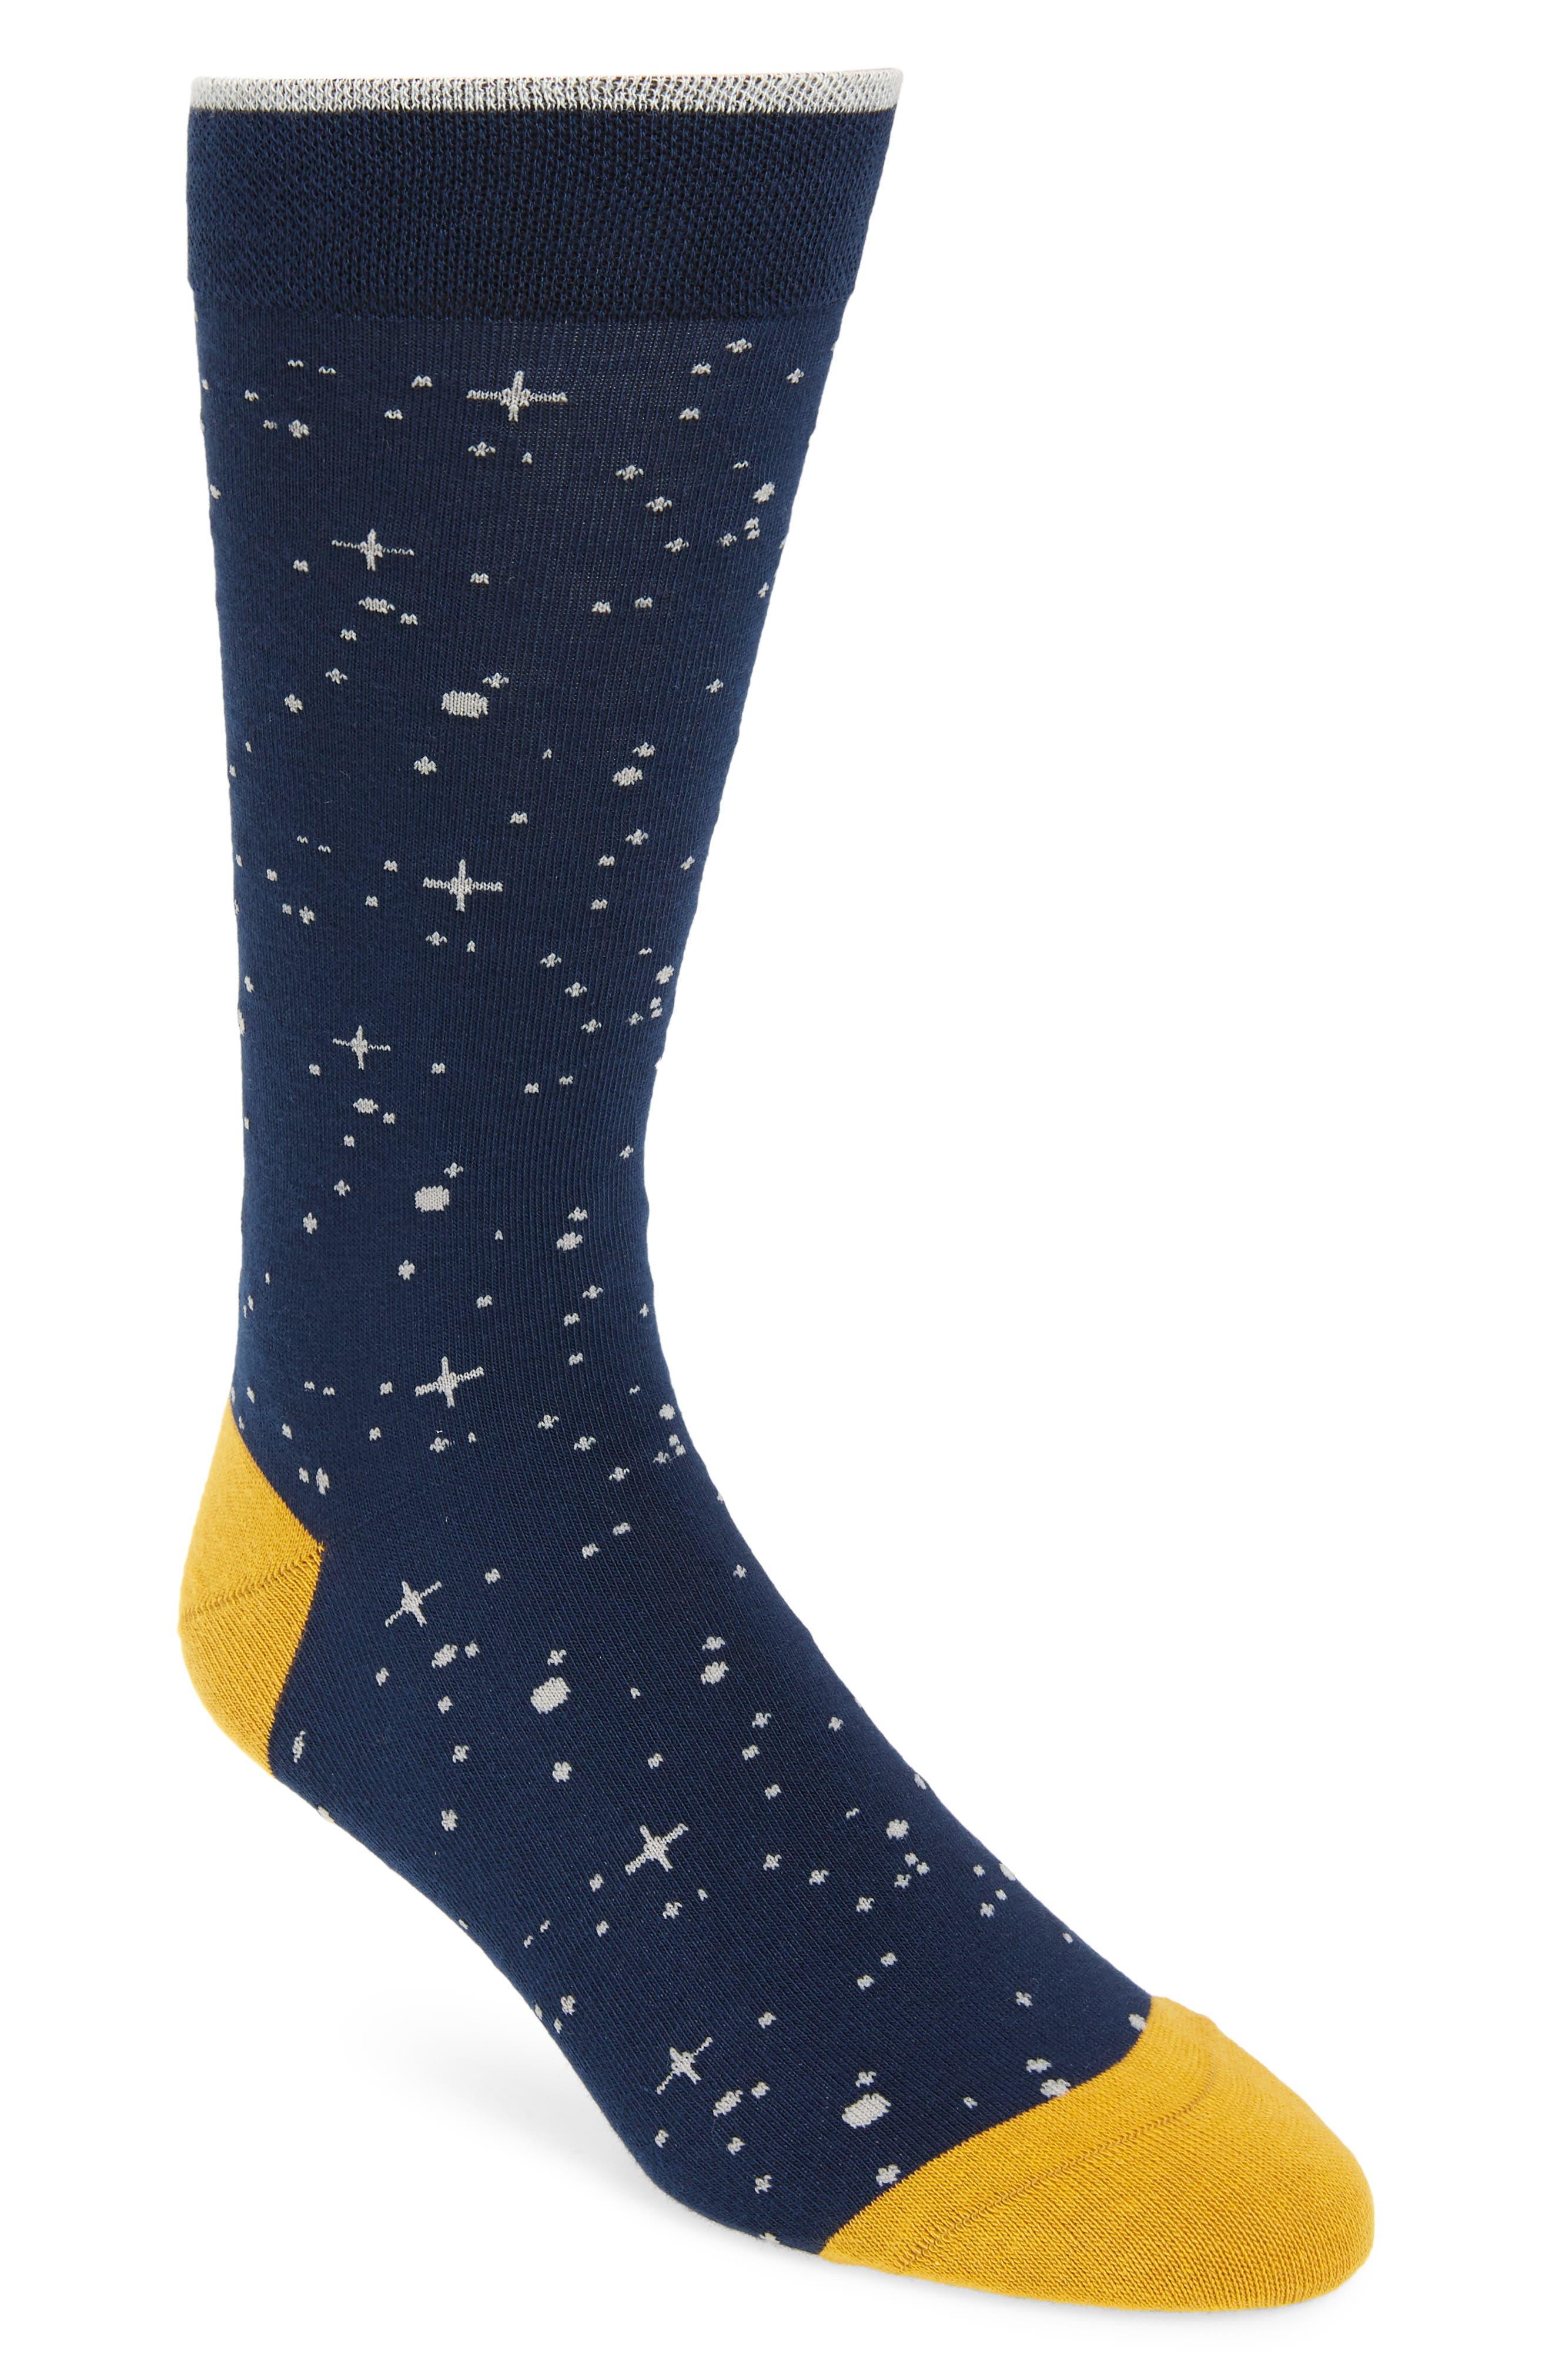 TED BAKER LONDON Starry Night Socks, Main, color, NAVY